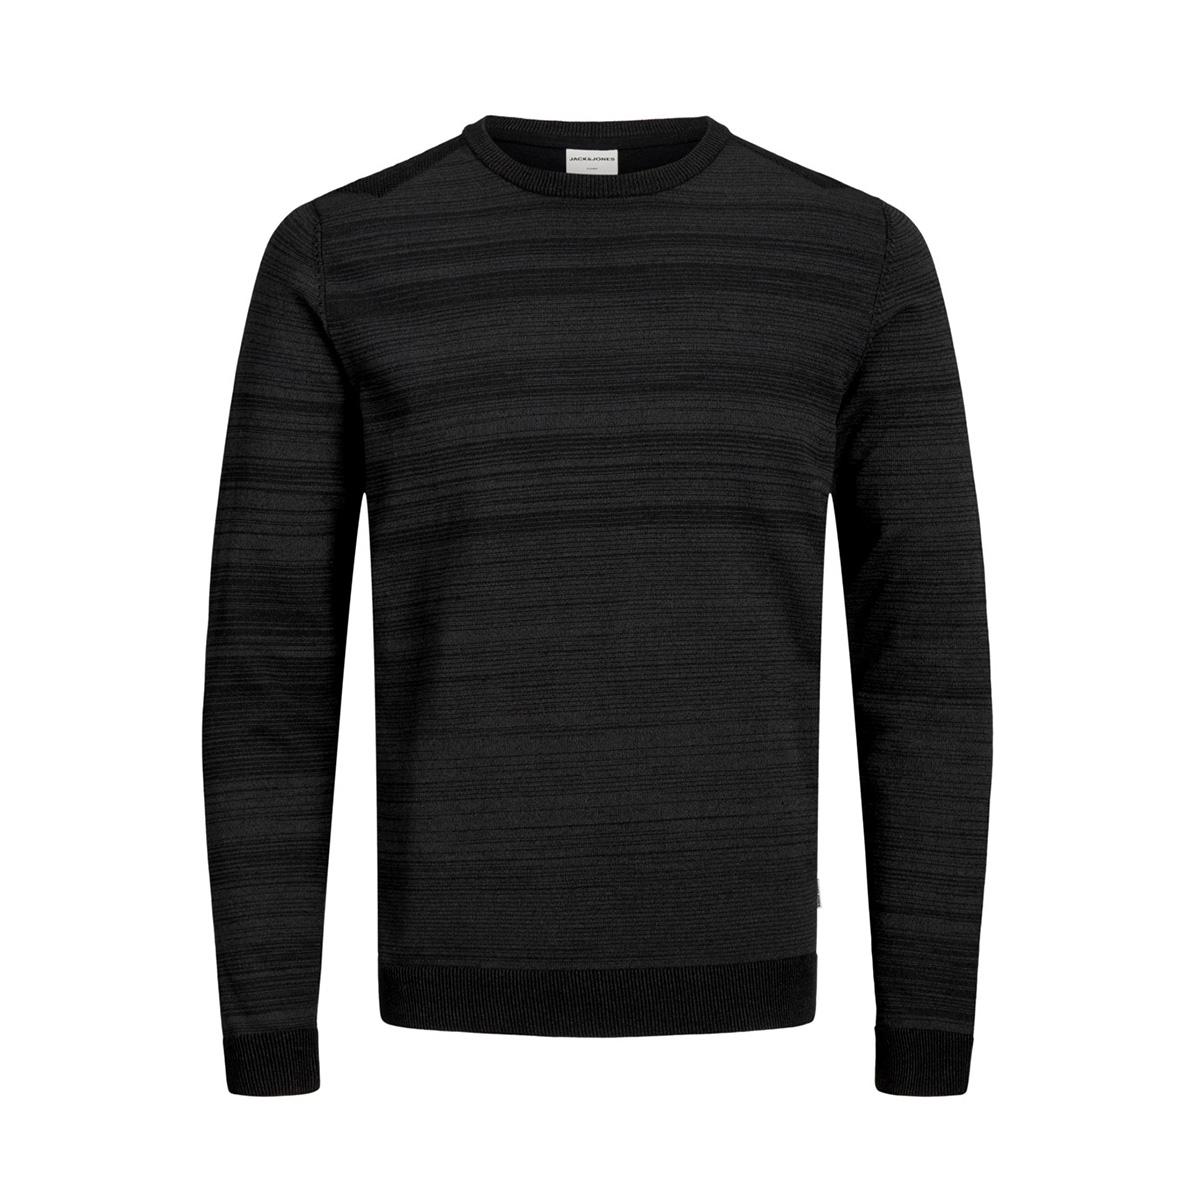 jcoelm knit crew neck 12155957 jack & jones trui black/twisted with